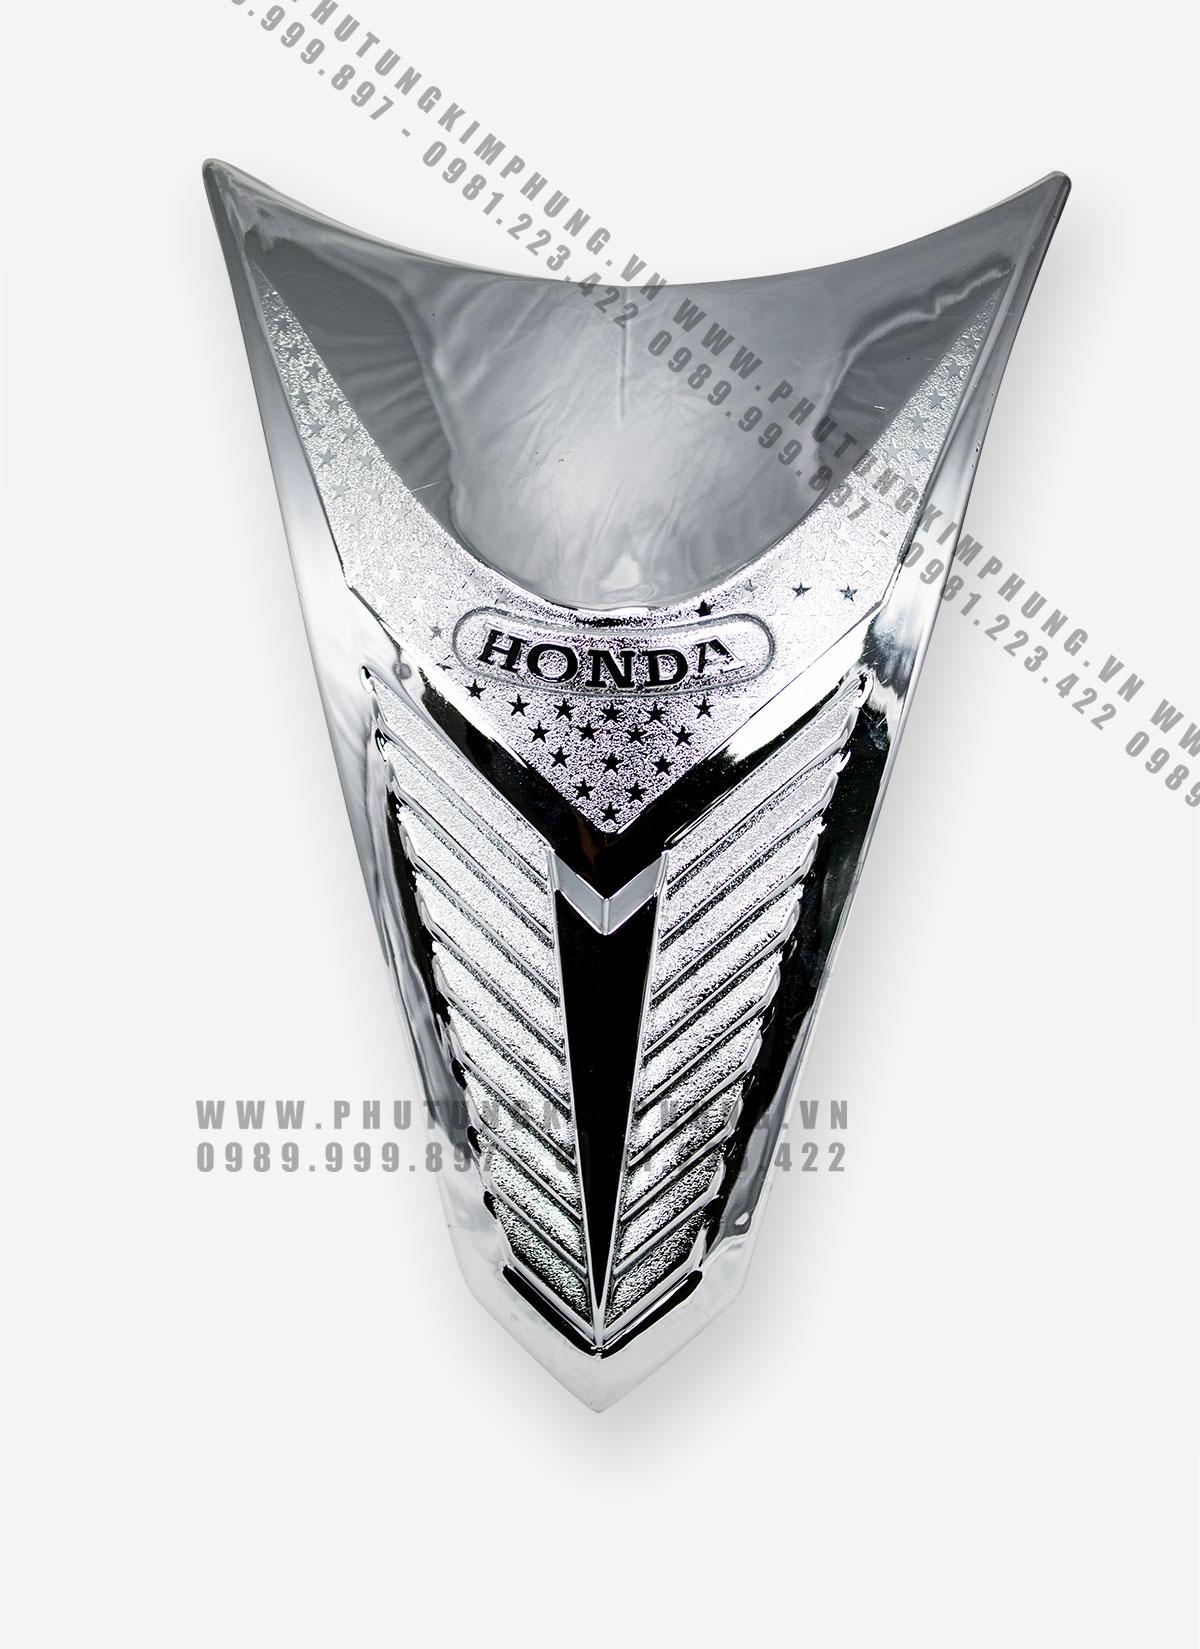 ỐP CHỈ MŨI VISION 2014